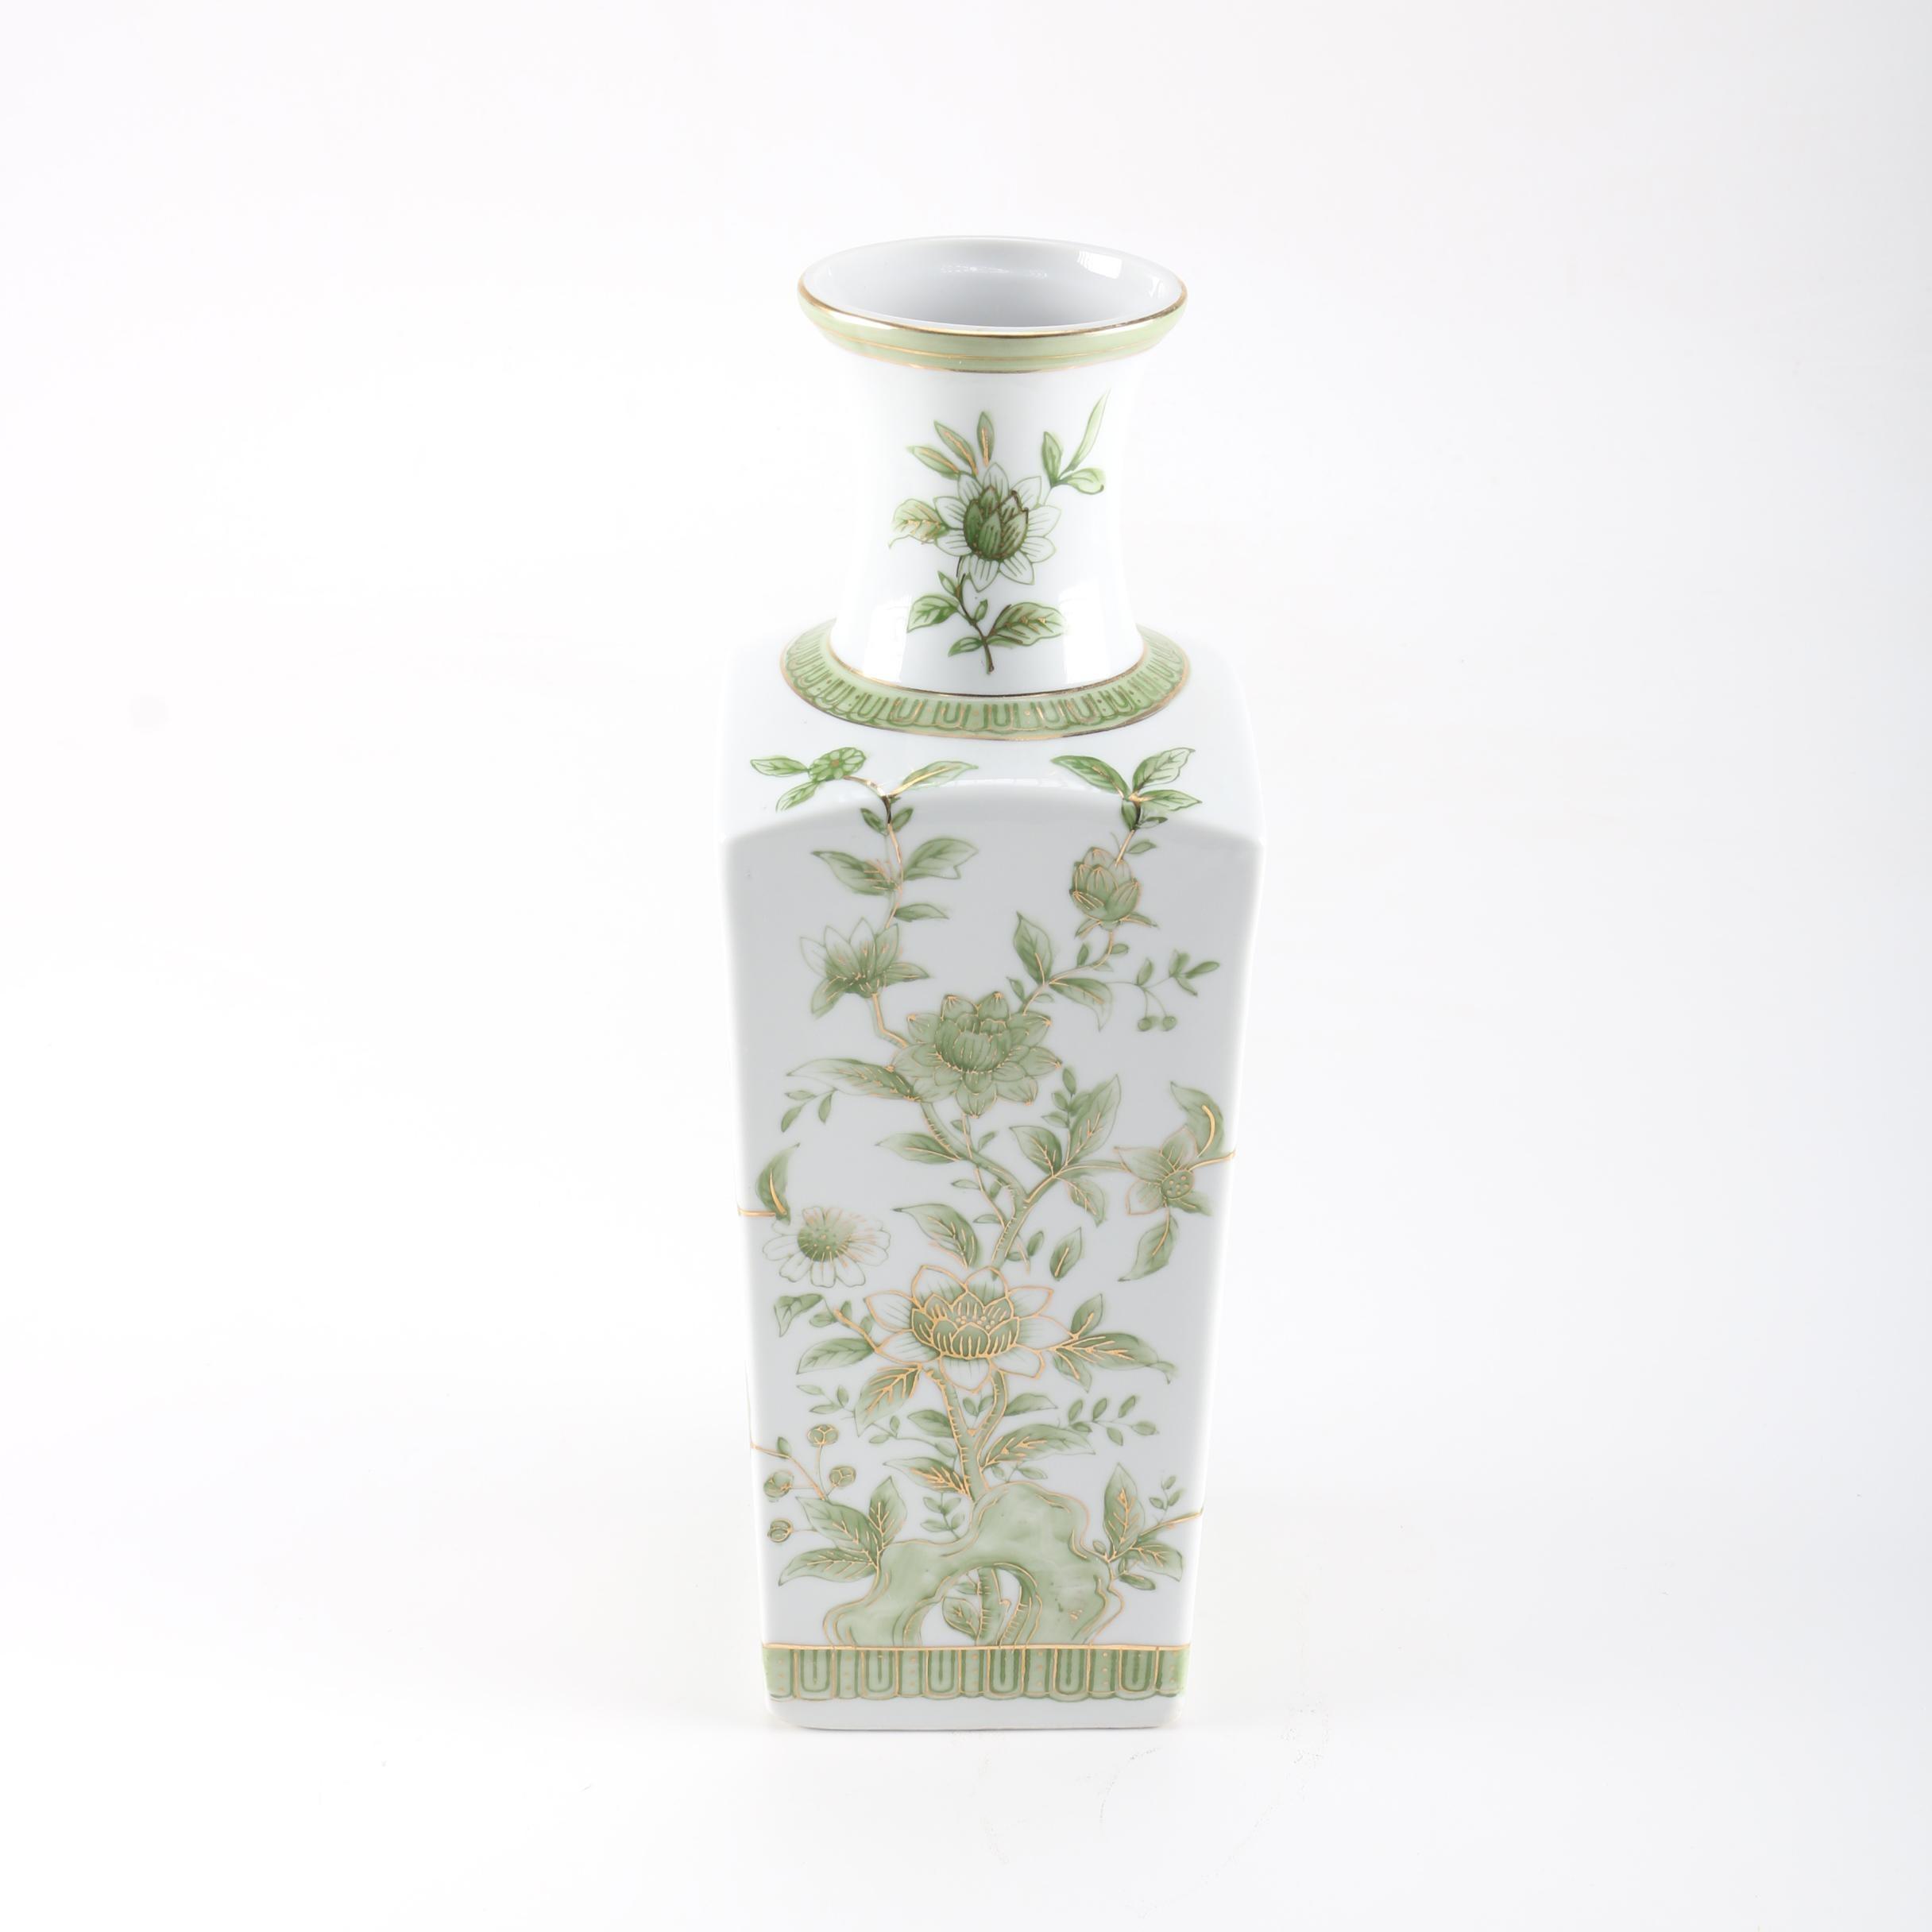 Hand-Painted Ceramic Floral Vase